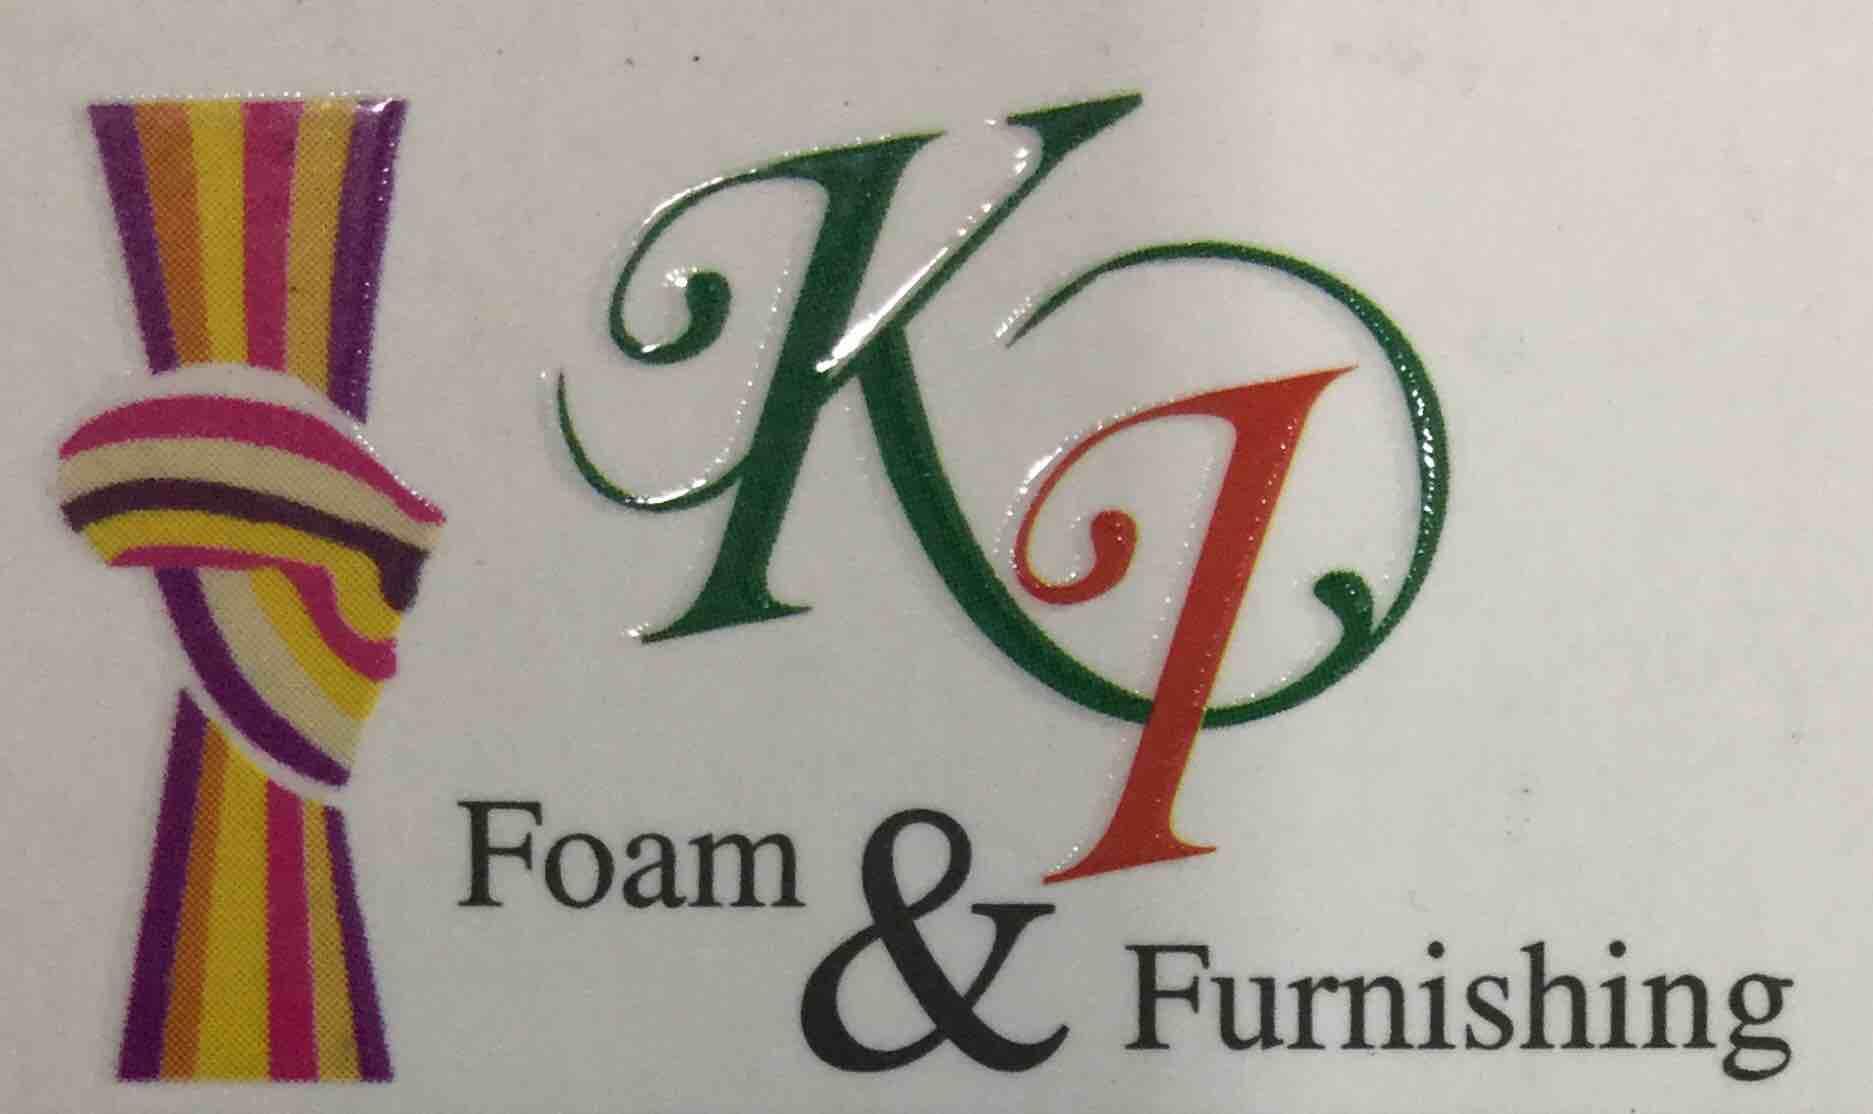 K P Foam And Furnishing